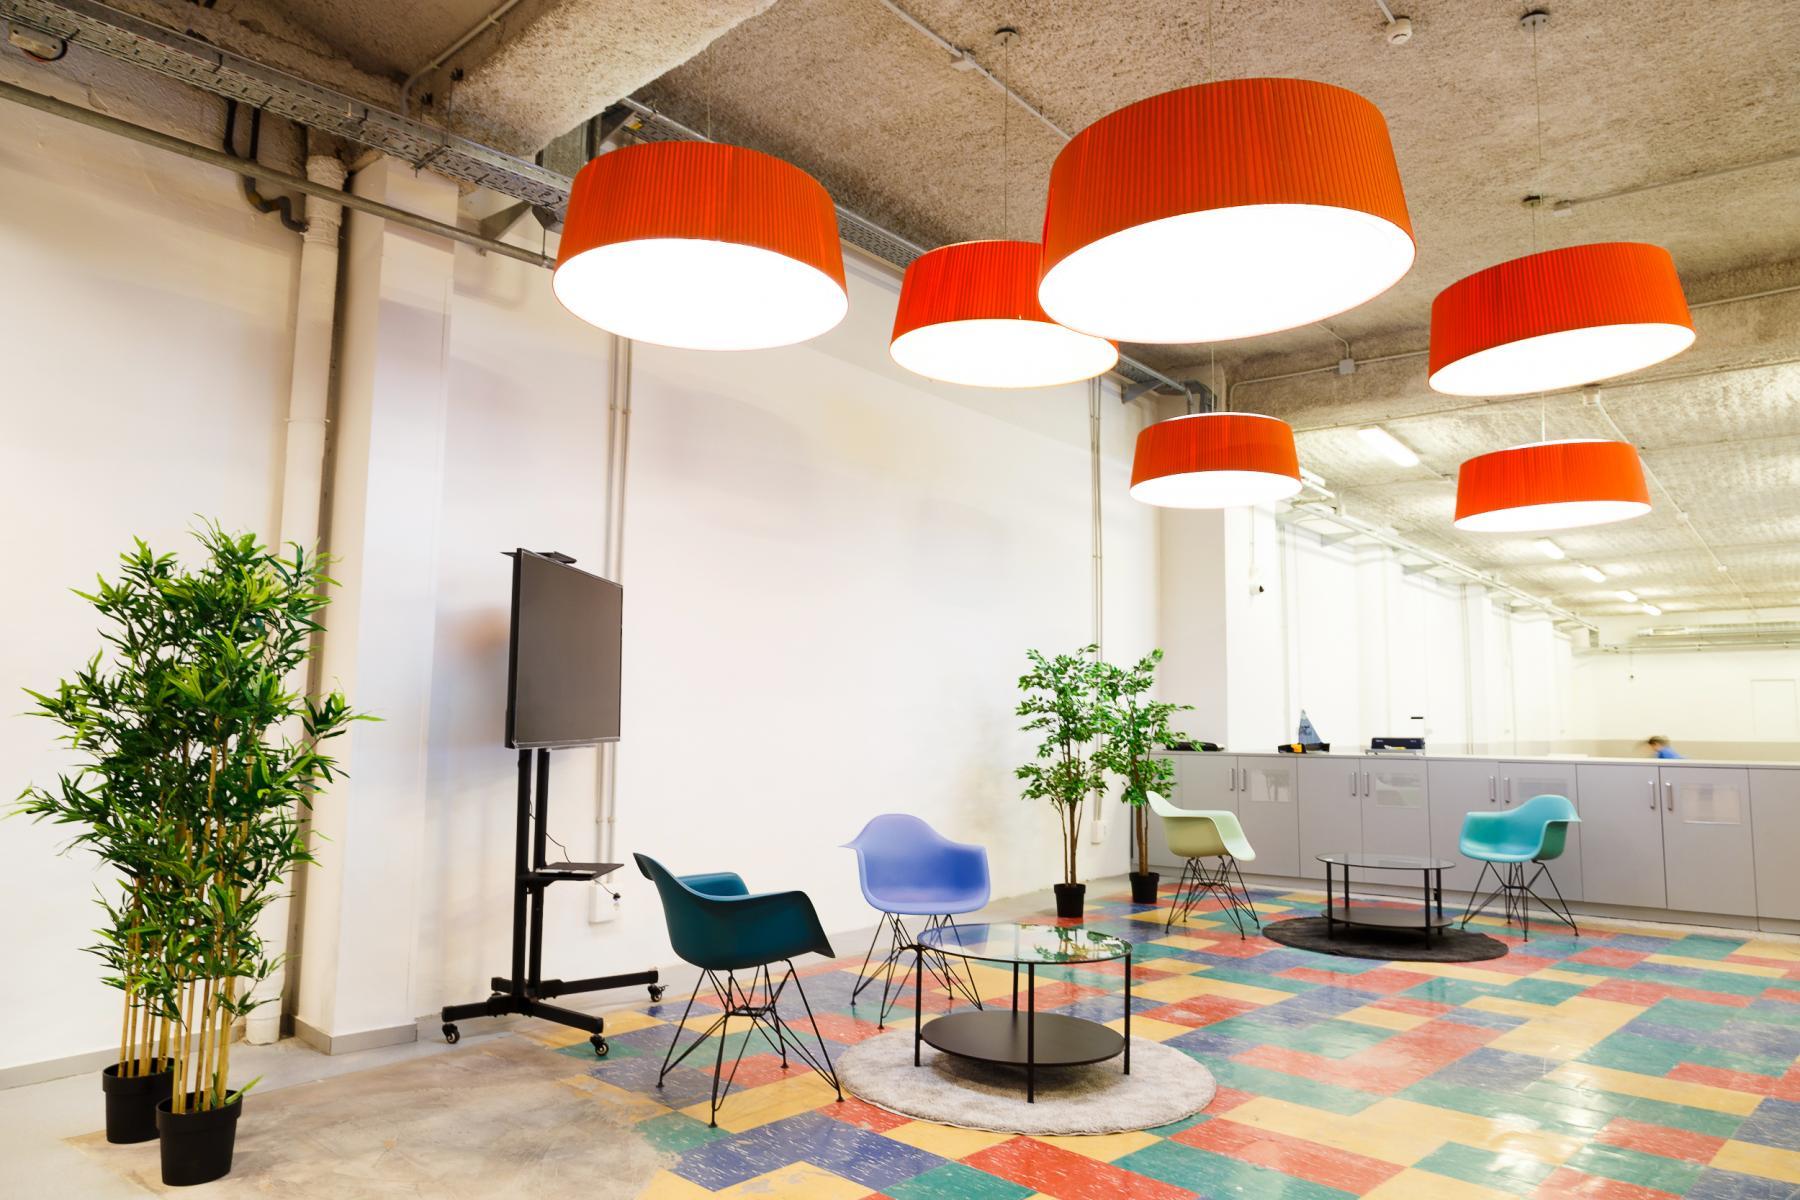 Alquilar oficinas Carrer del Sol 62, Barcelona (4)